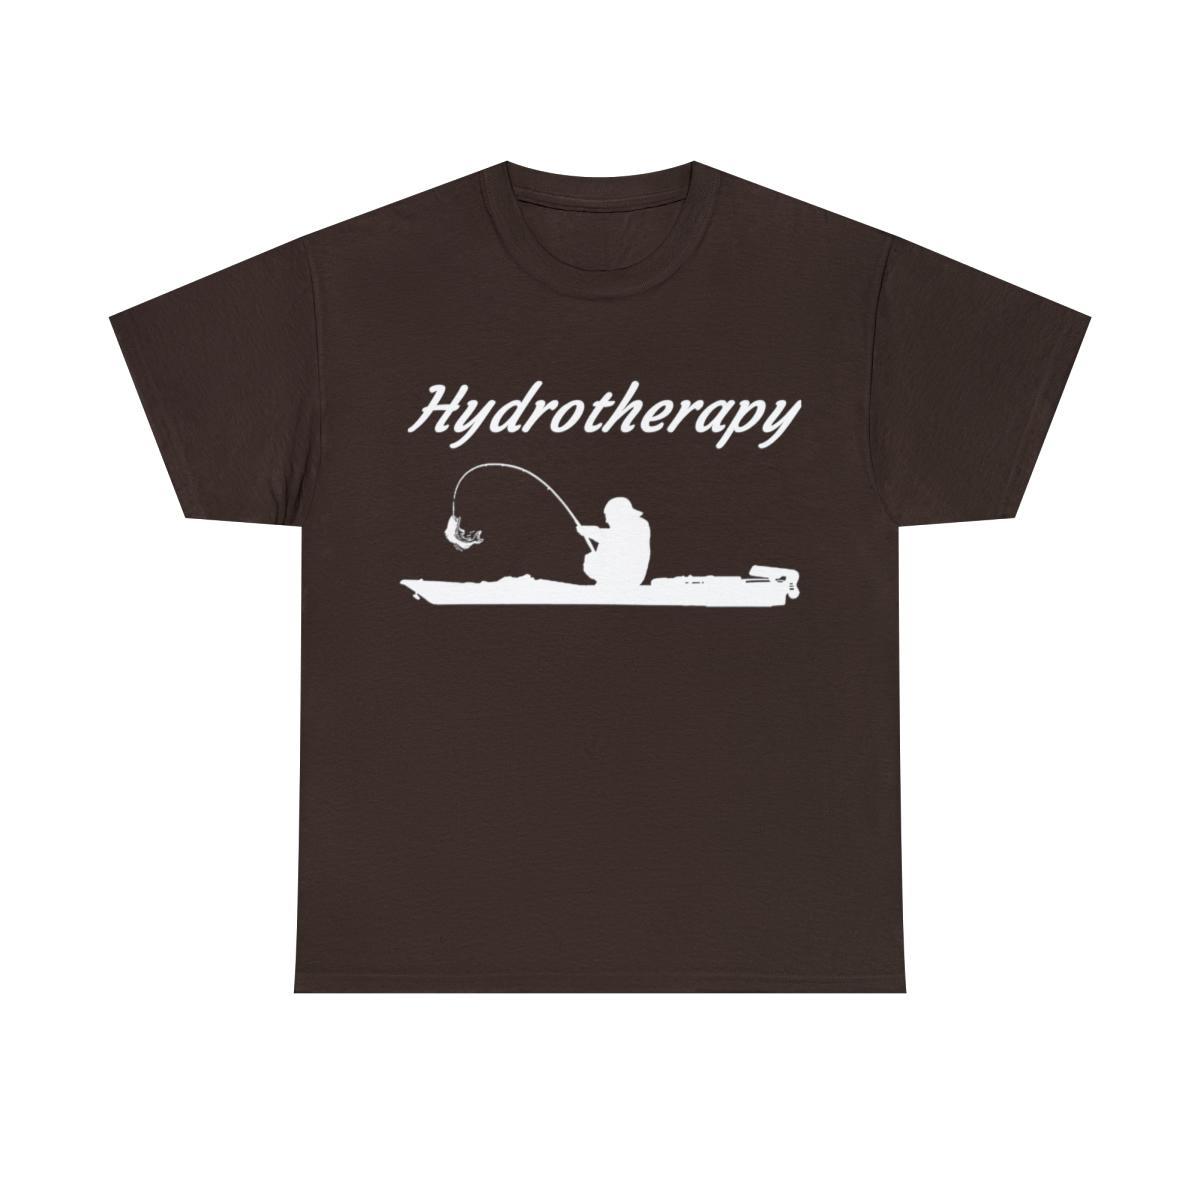 Hydrotherapy-Kayak-T-Shirt-Kayak-Fishing-Unisex-Heavy-Cotton-T-Shirt thumbnail 11